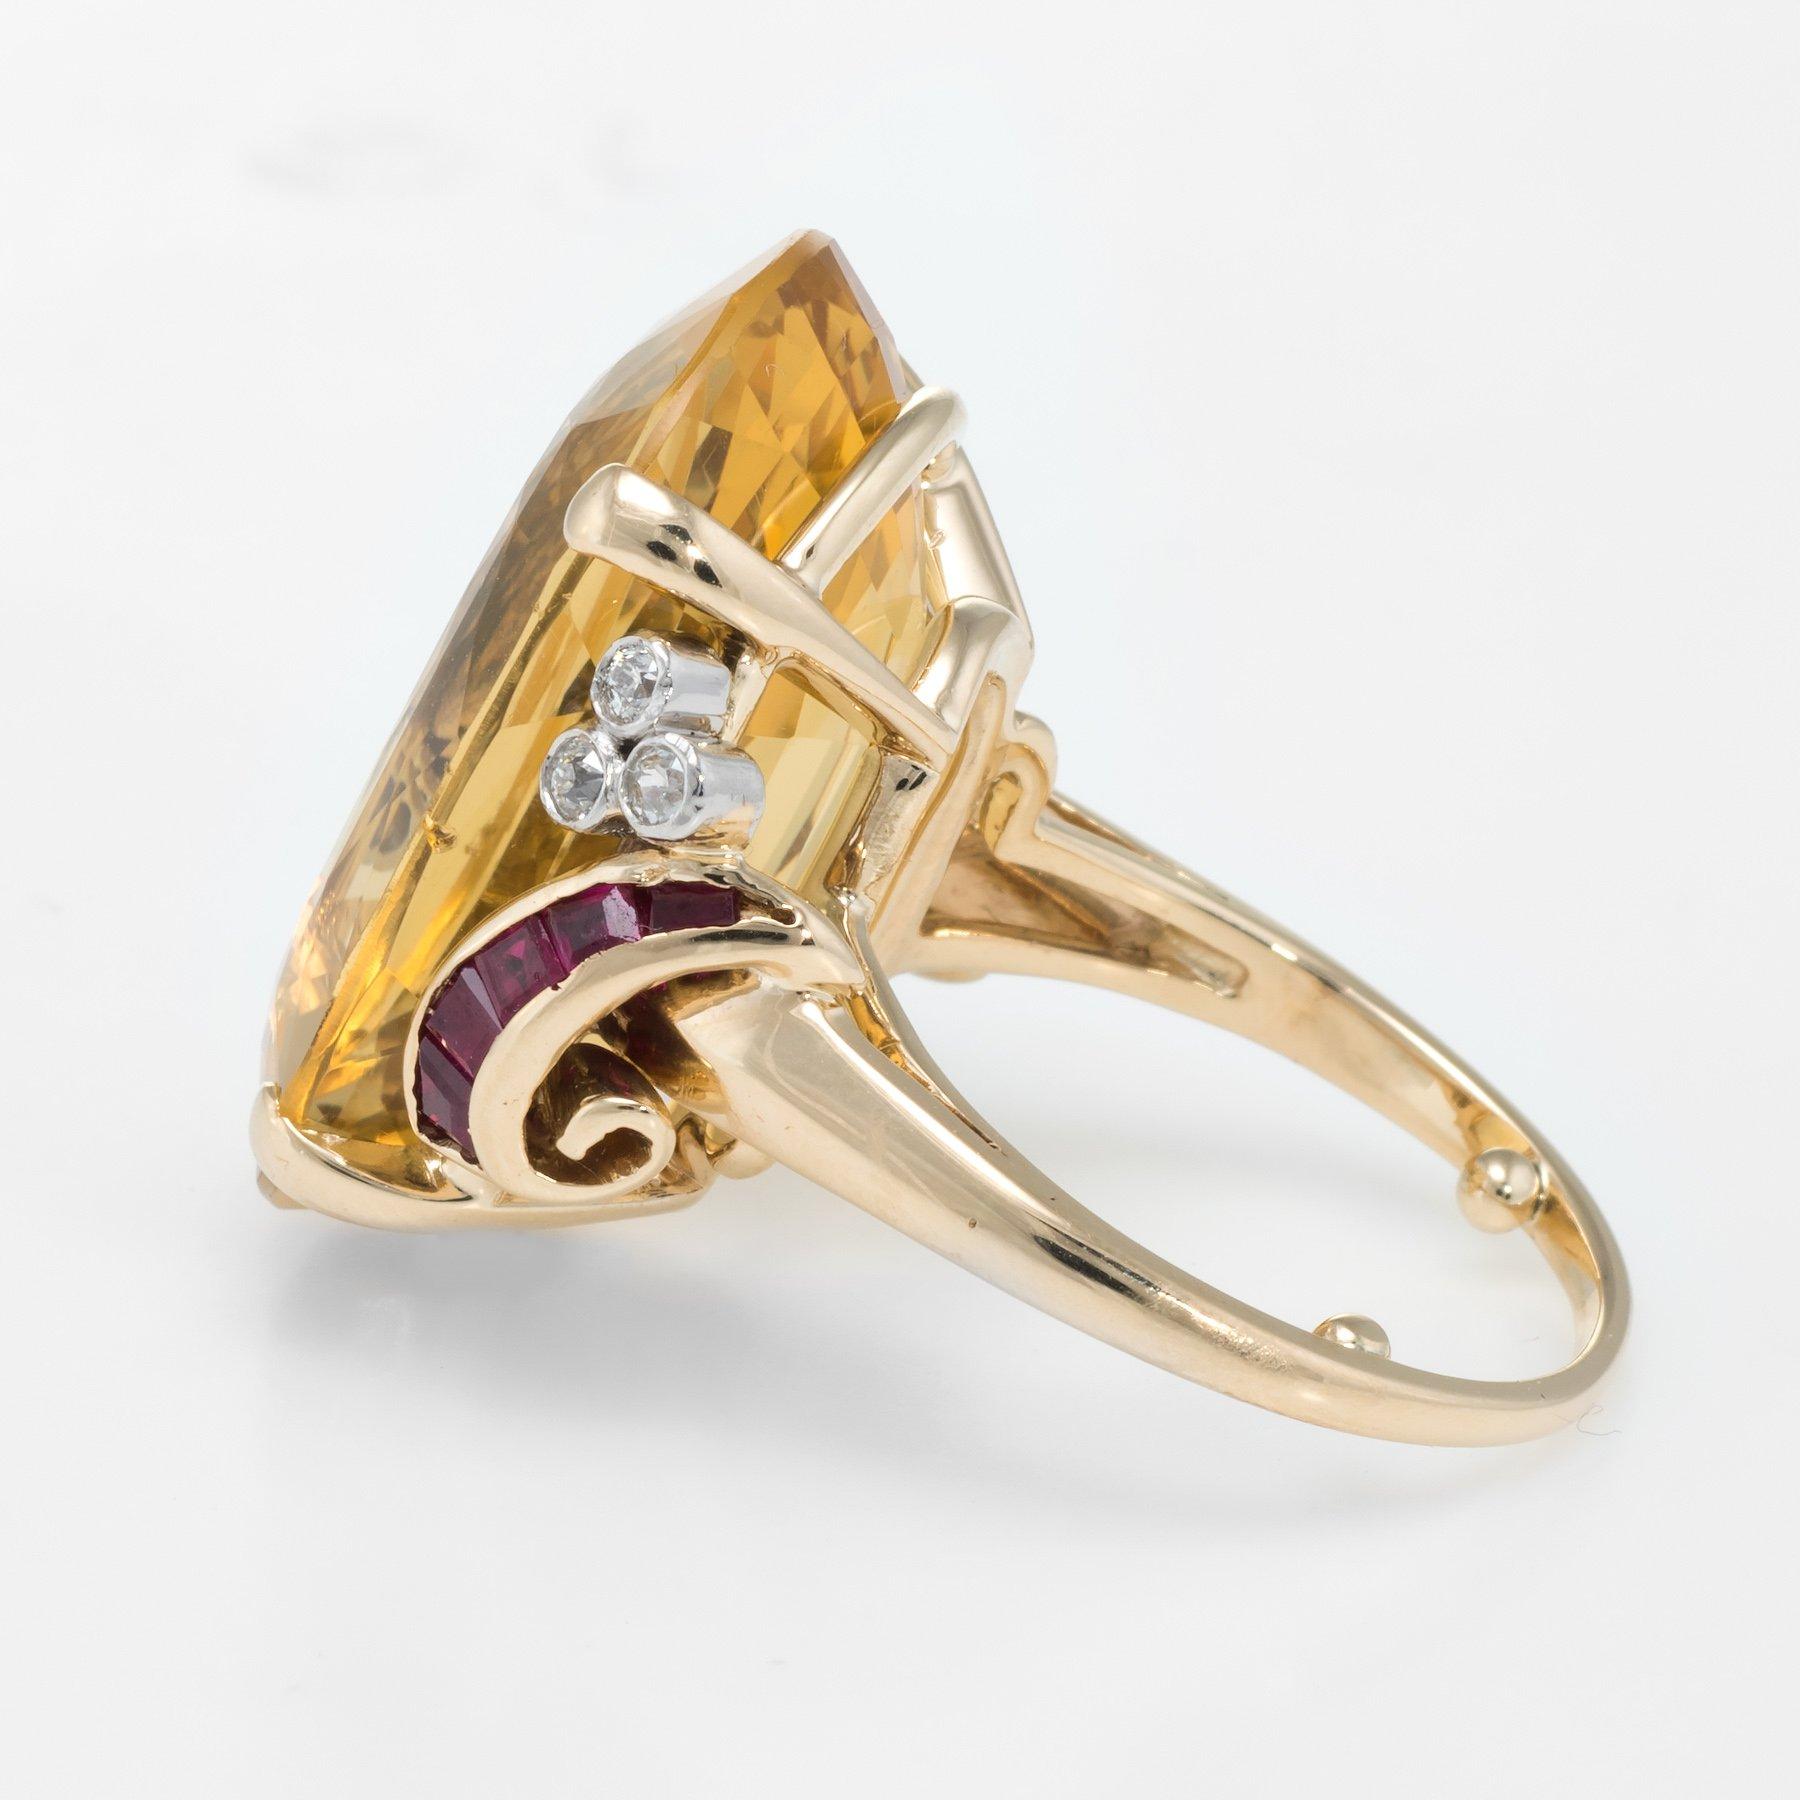 d8429b982fdbf Retro Citrine Ruby Diamond Cocktail Ring Vintage 14k Yellow Gold ...